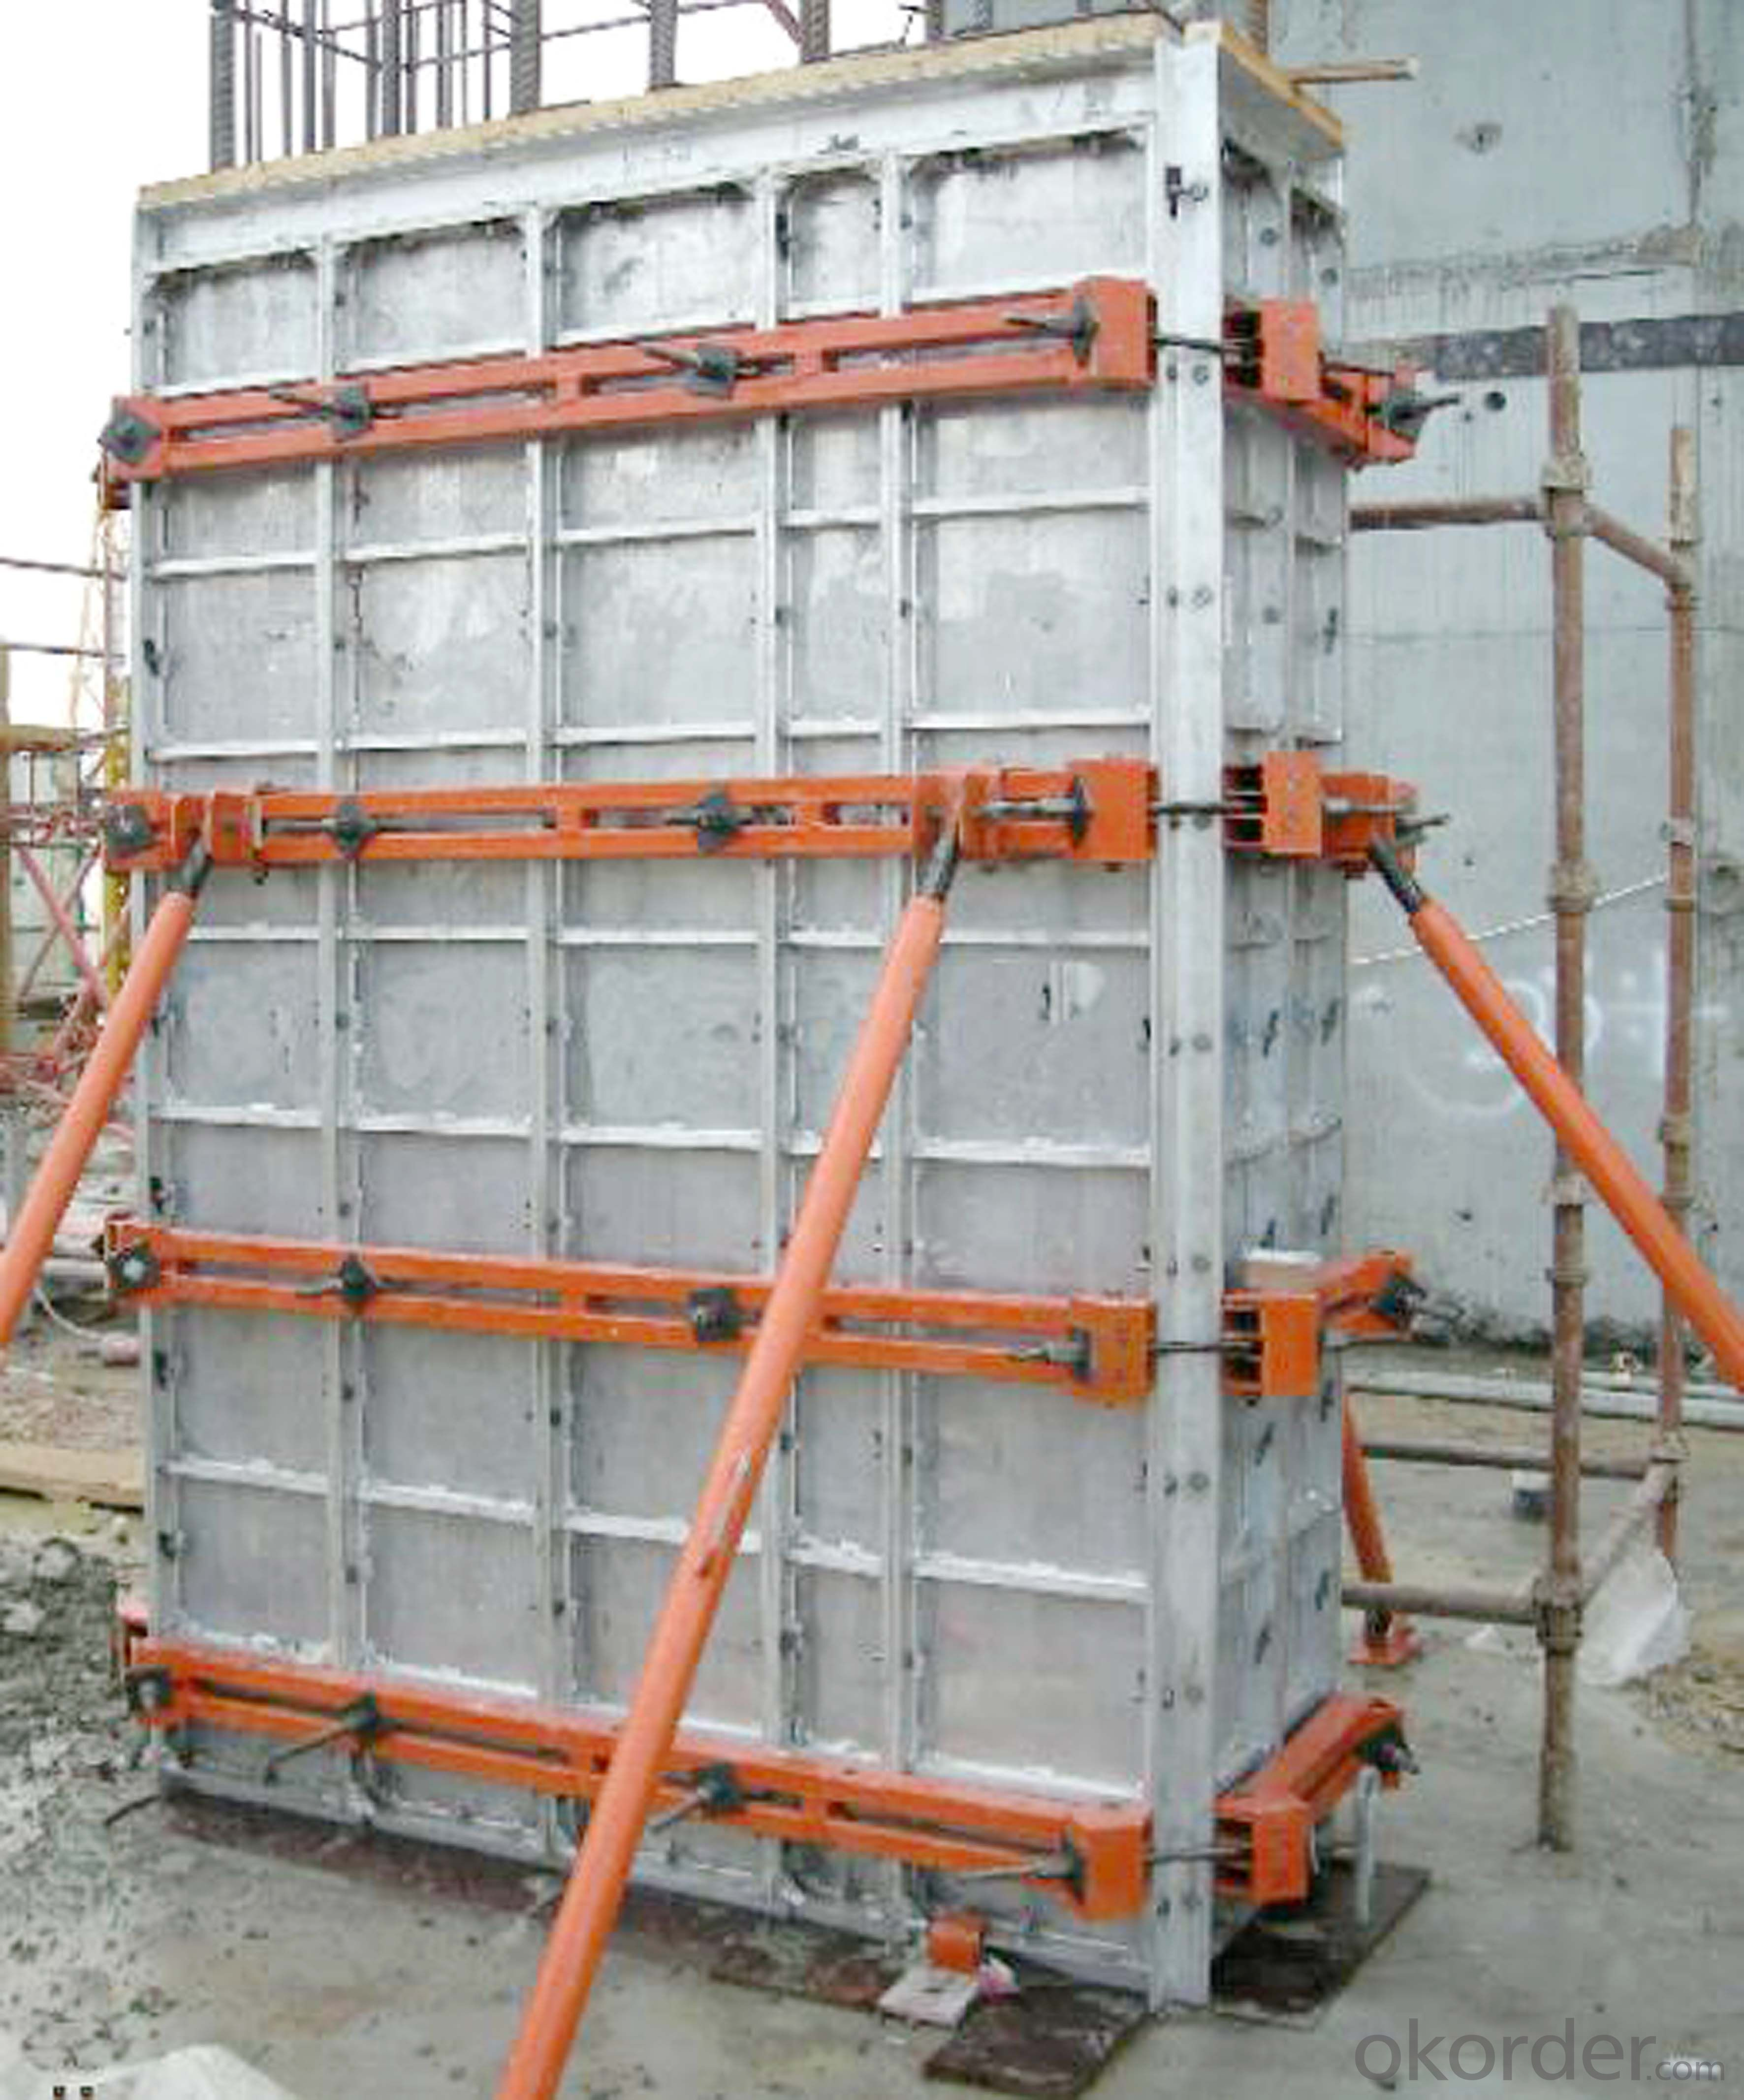 Adjustable Aluminum Formwork For Rectangle / Square Concrete Column Formwork